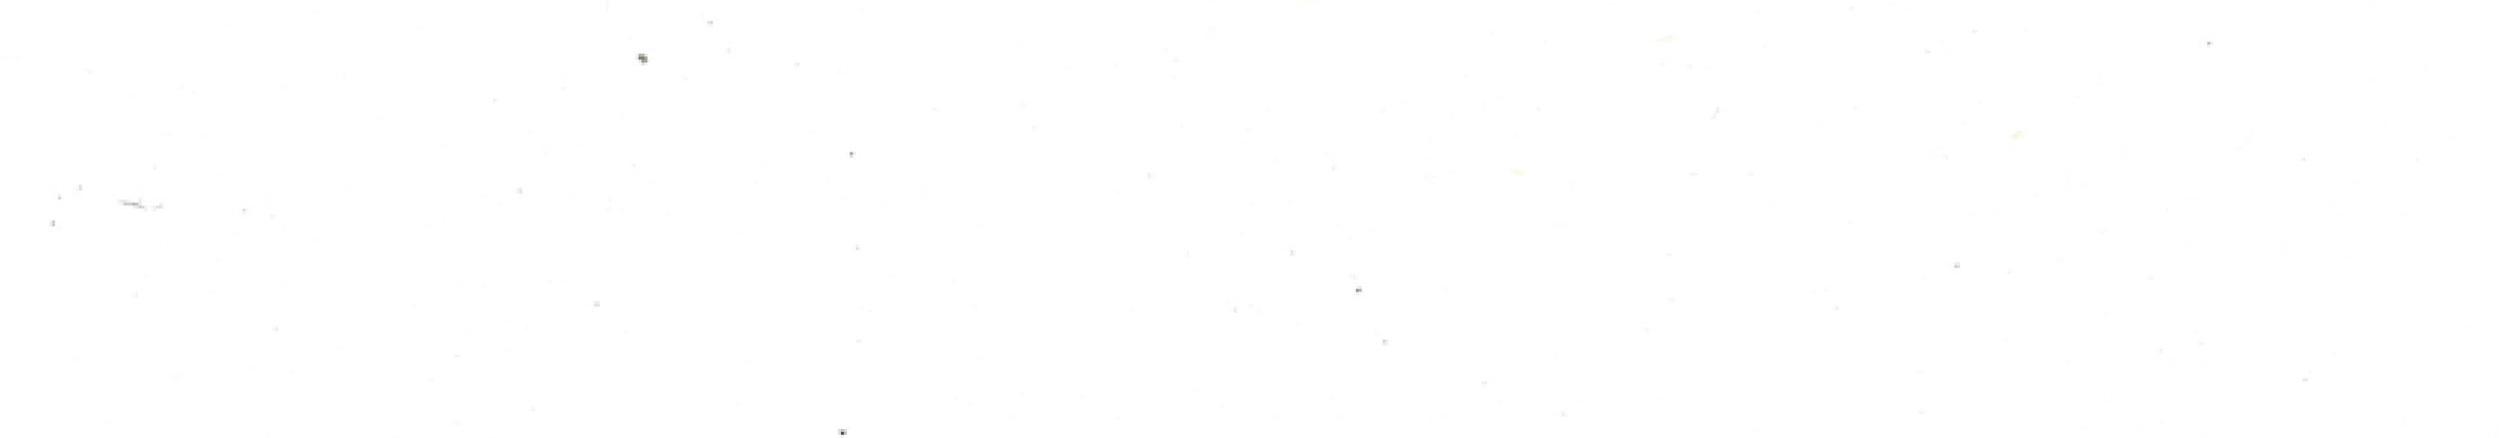 viviana-Troya-blank.jpg